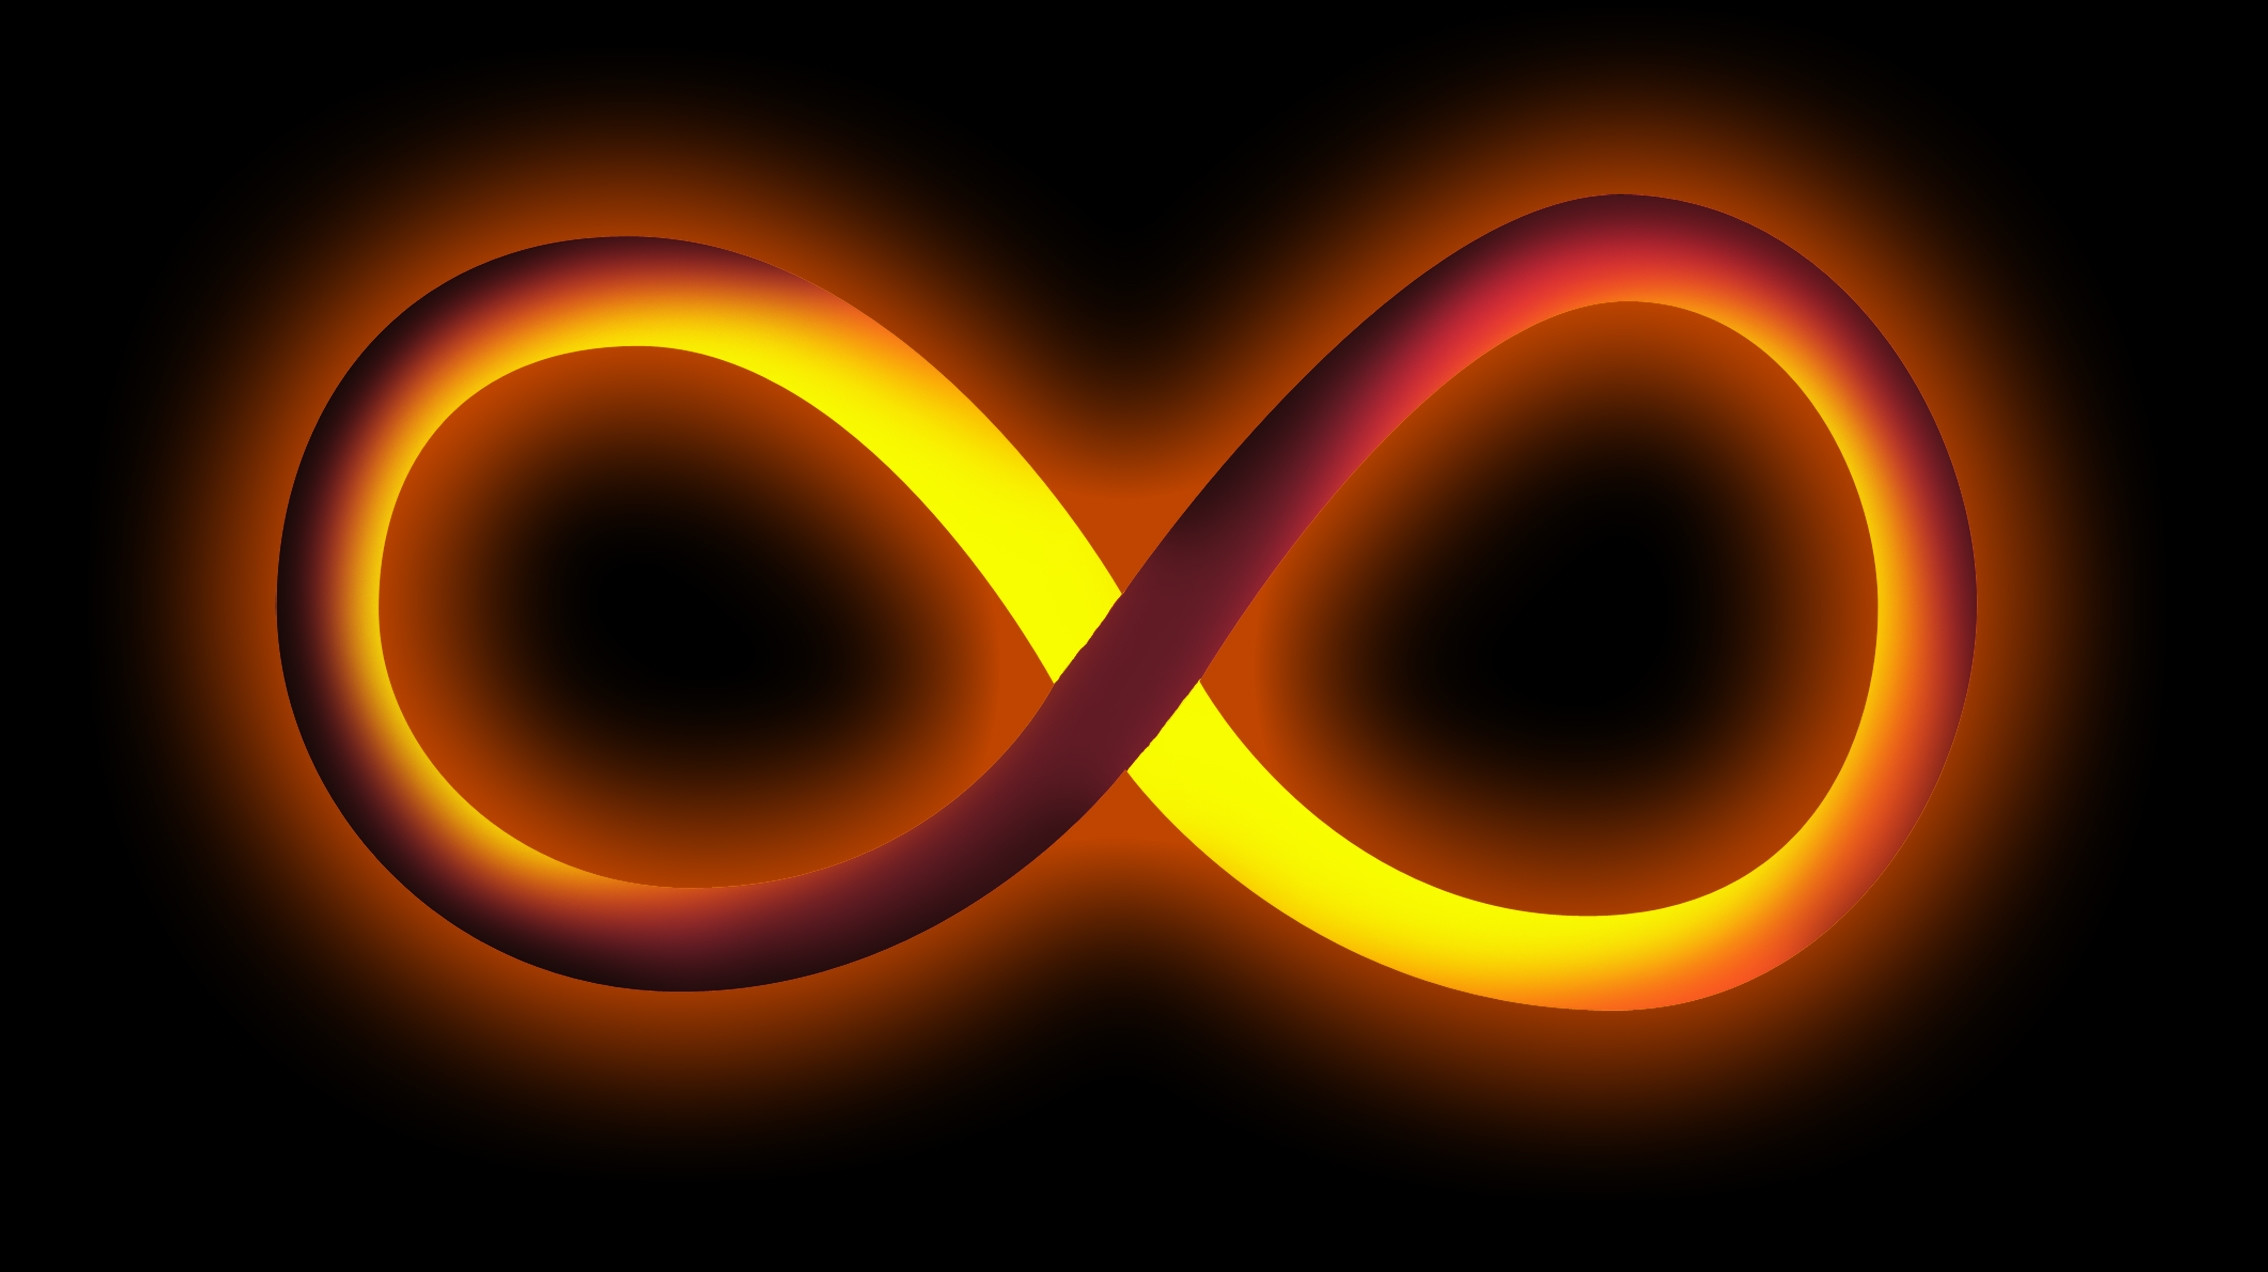 infinity symbol logo wallpaper – photo #19. Slovenský katolícky akademický  spolok Istropolitan » Blog Archive .